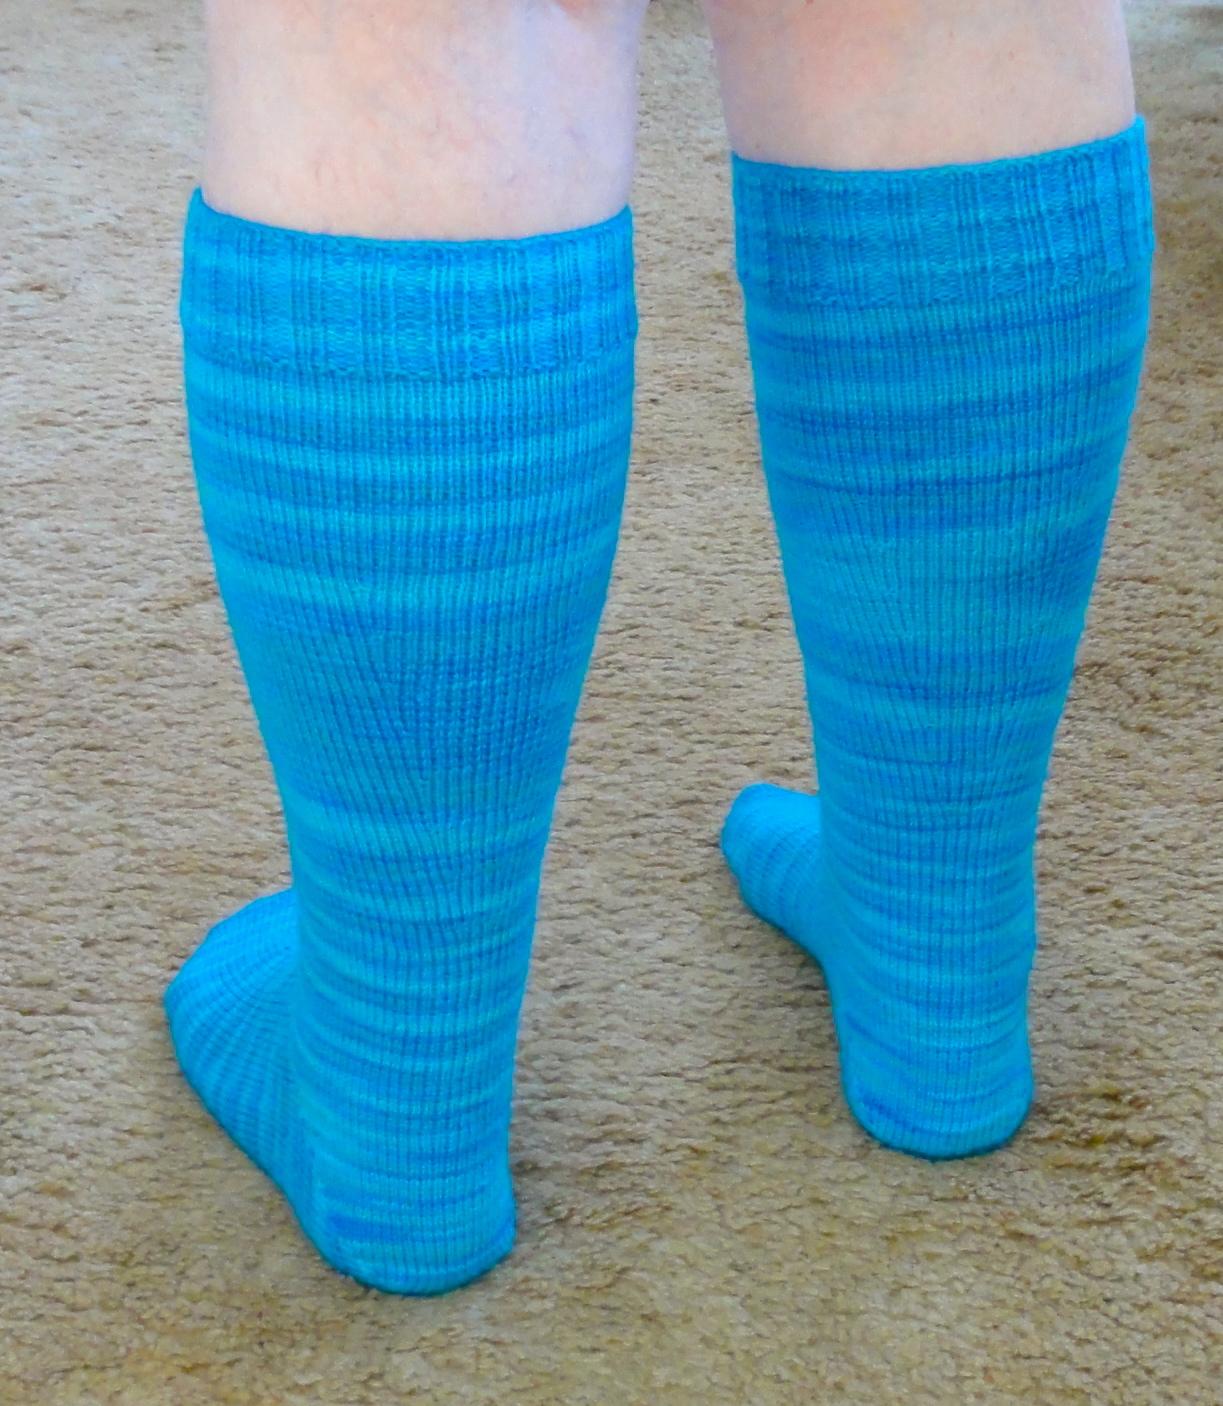 Knitting Patterns Socks On Circular Needles : socks on two circular needles All Kinds Of Knitting